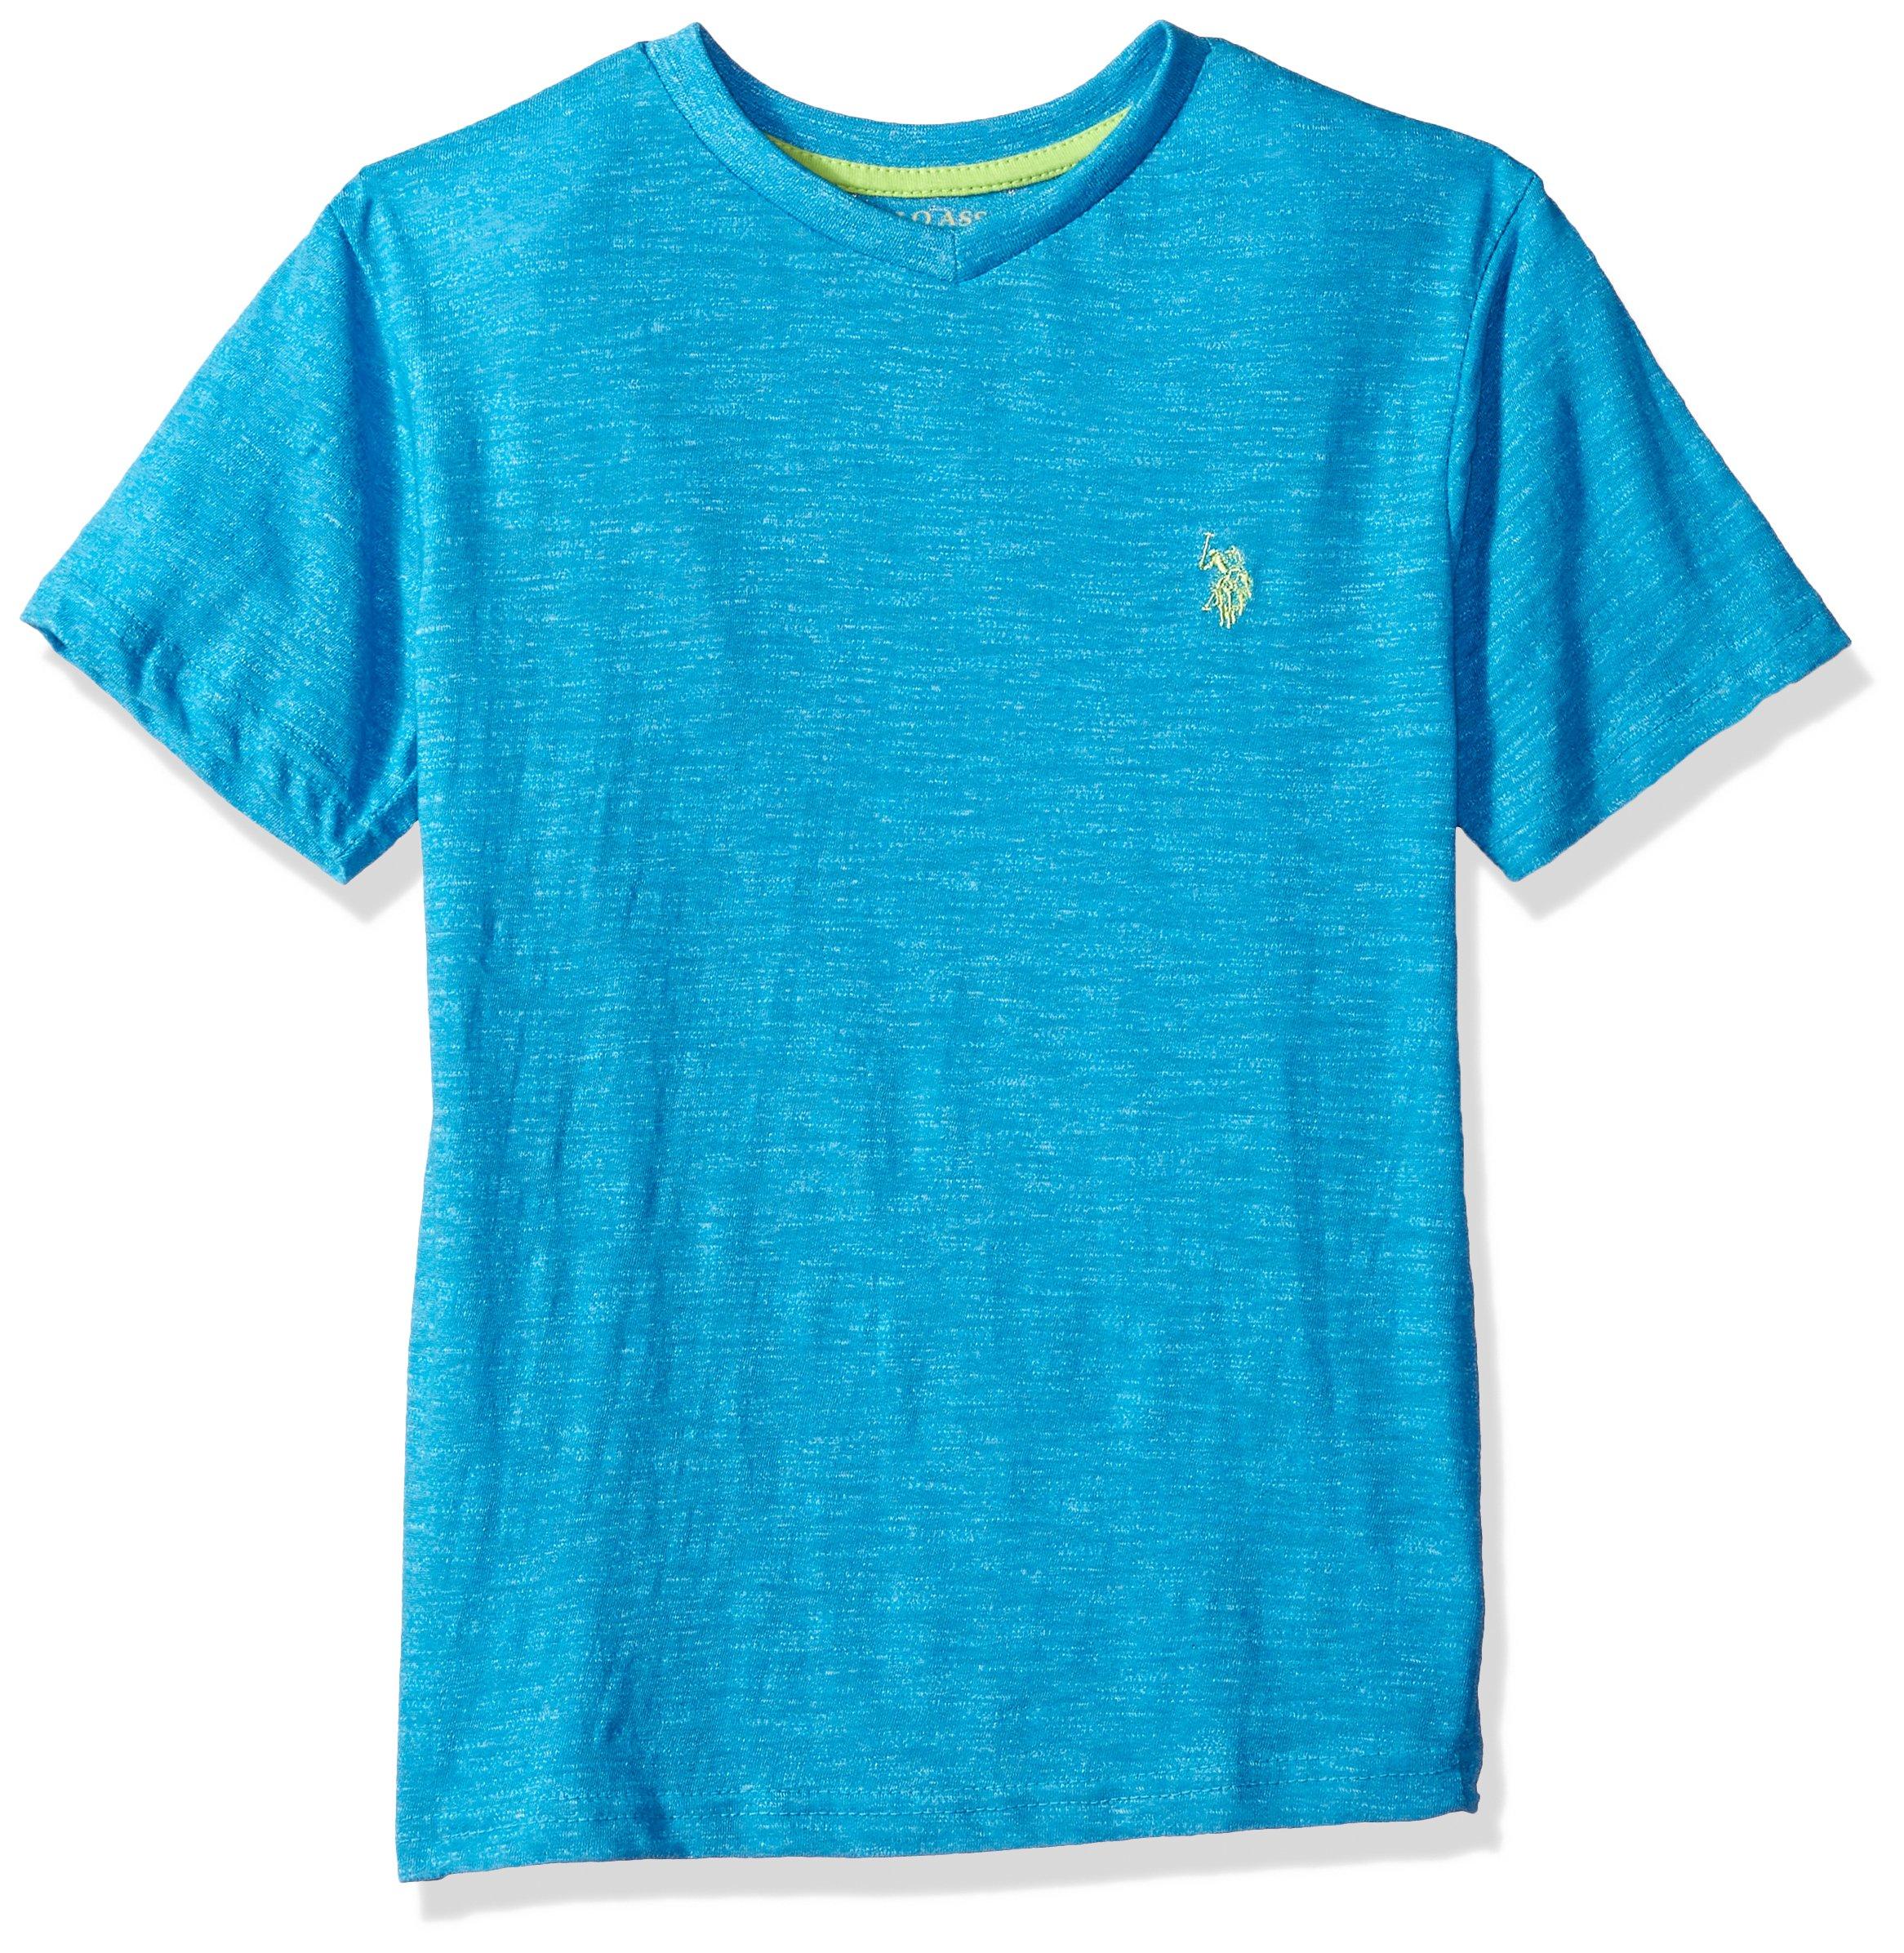 U.S. Polo Assn. Boys' Big Short Sleeve Solid V-Neck T-Shirt Marbled Marled Blue, 14/16